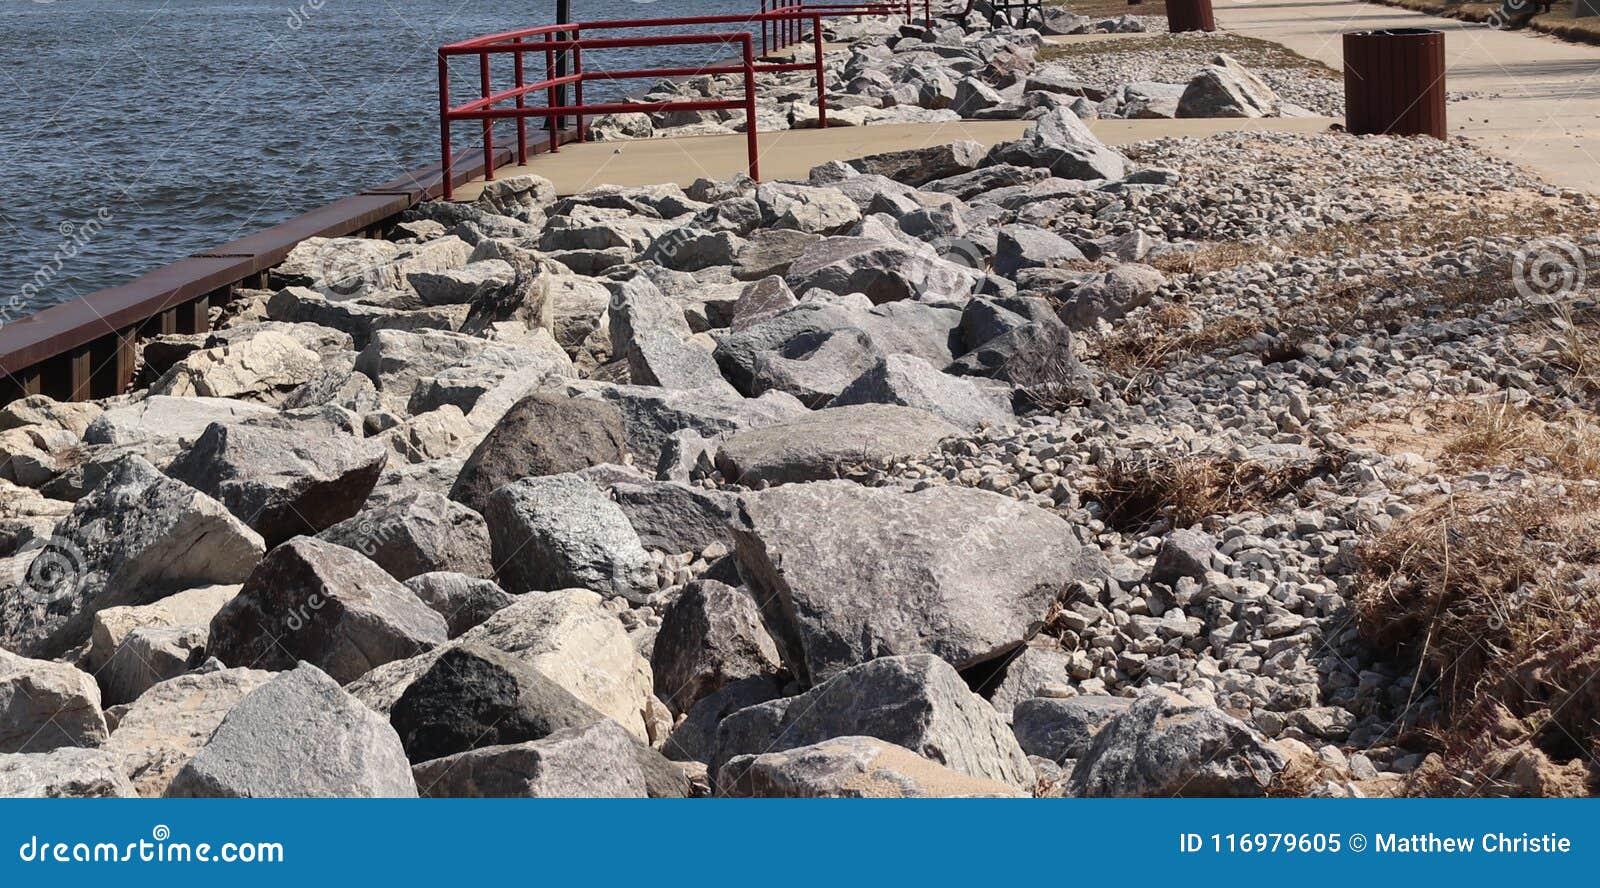 Outdoor, Lake Michigan, Sand, Rocks, Birds, River, Waves, Pier